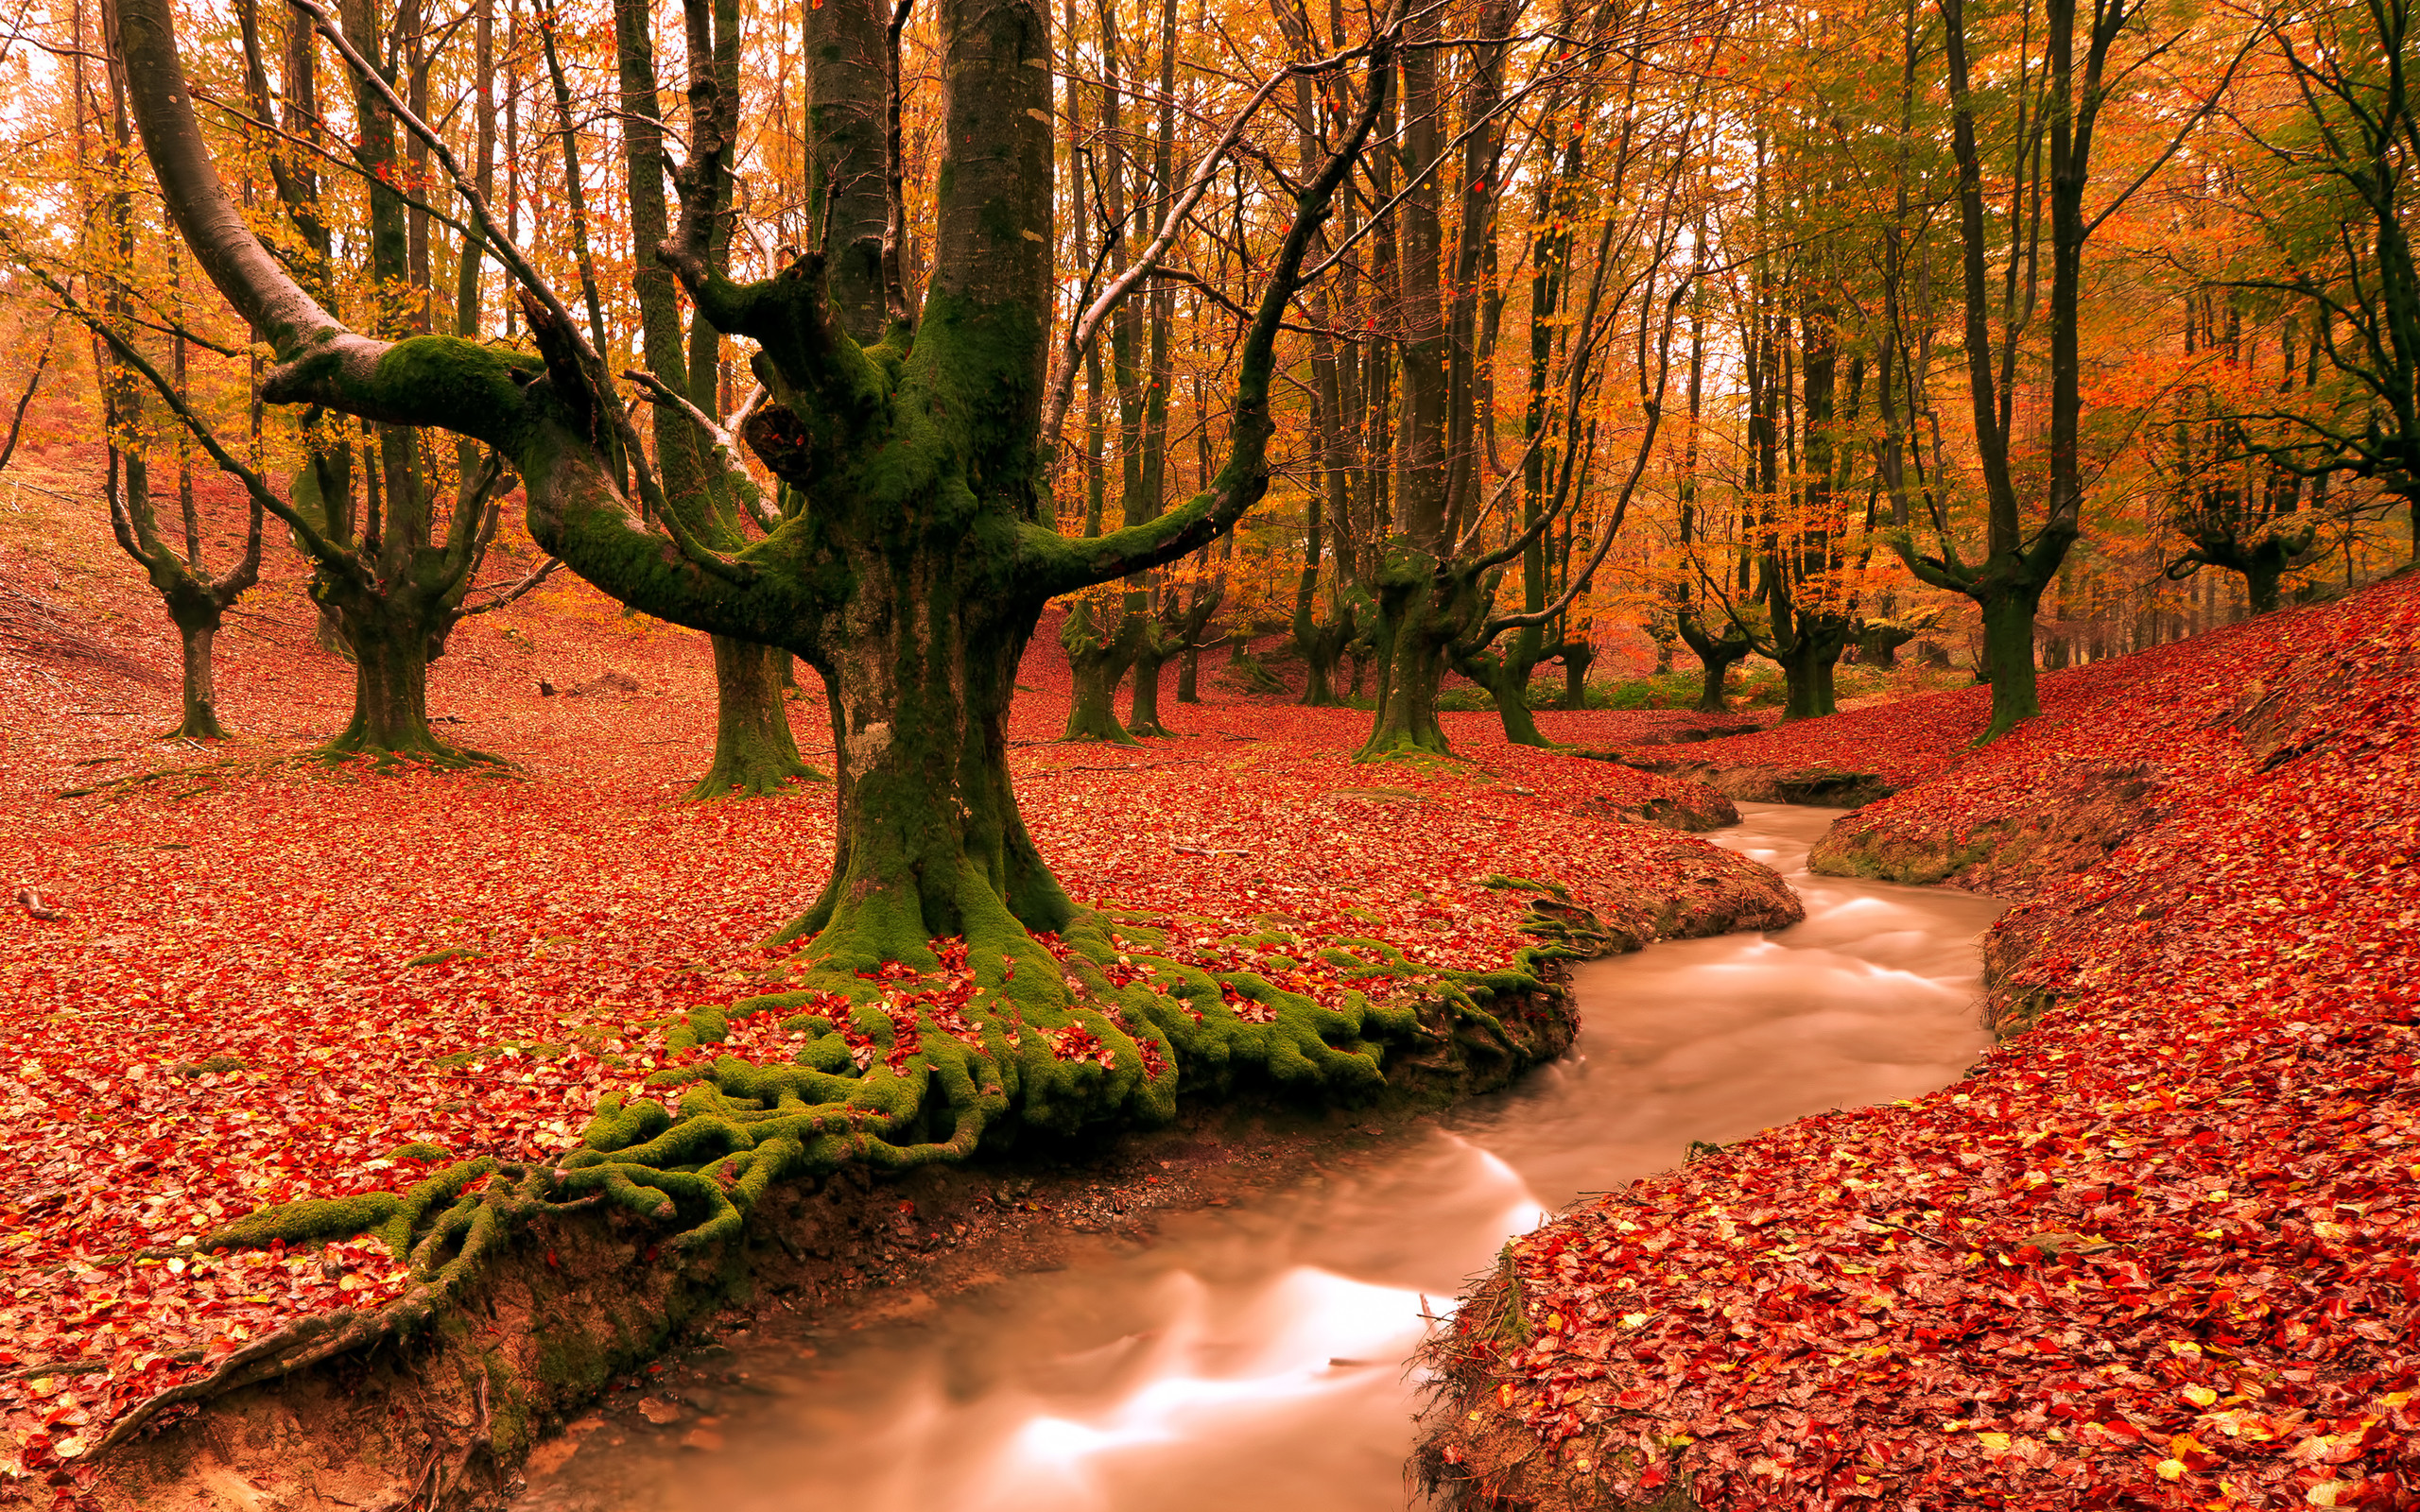 Autumn Pictures for Desktop Backgrounds ·① WallpaperTag